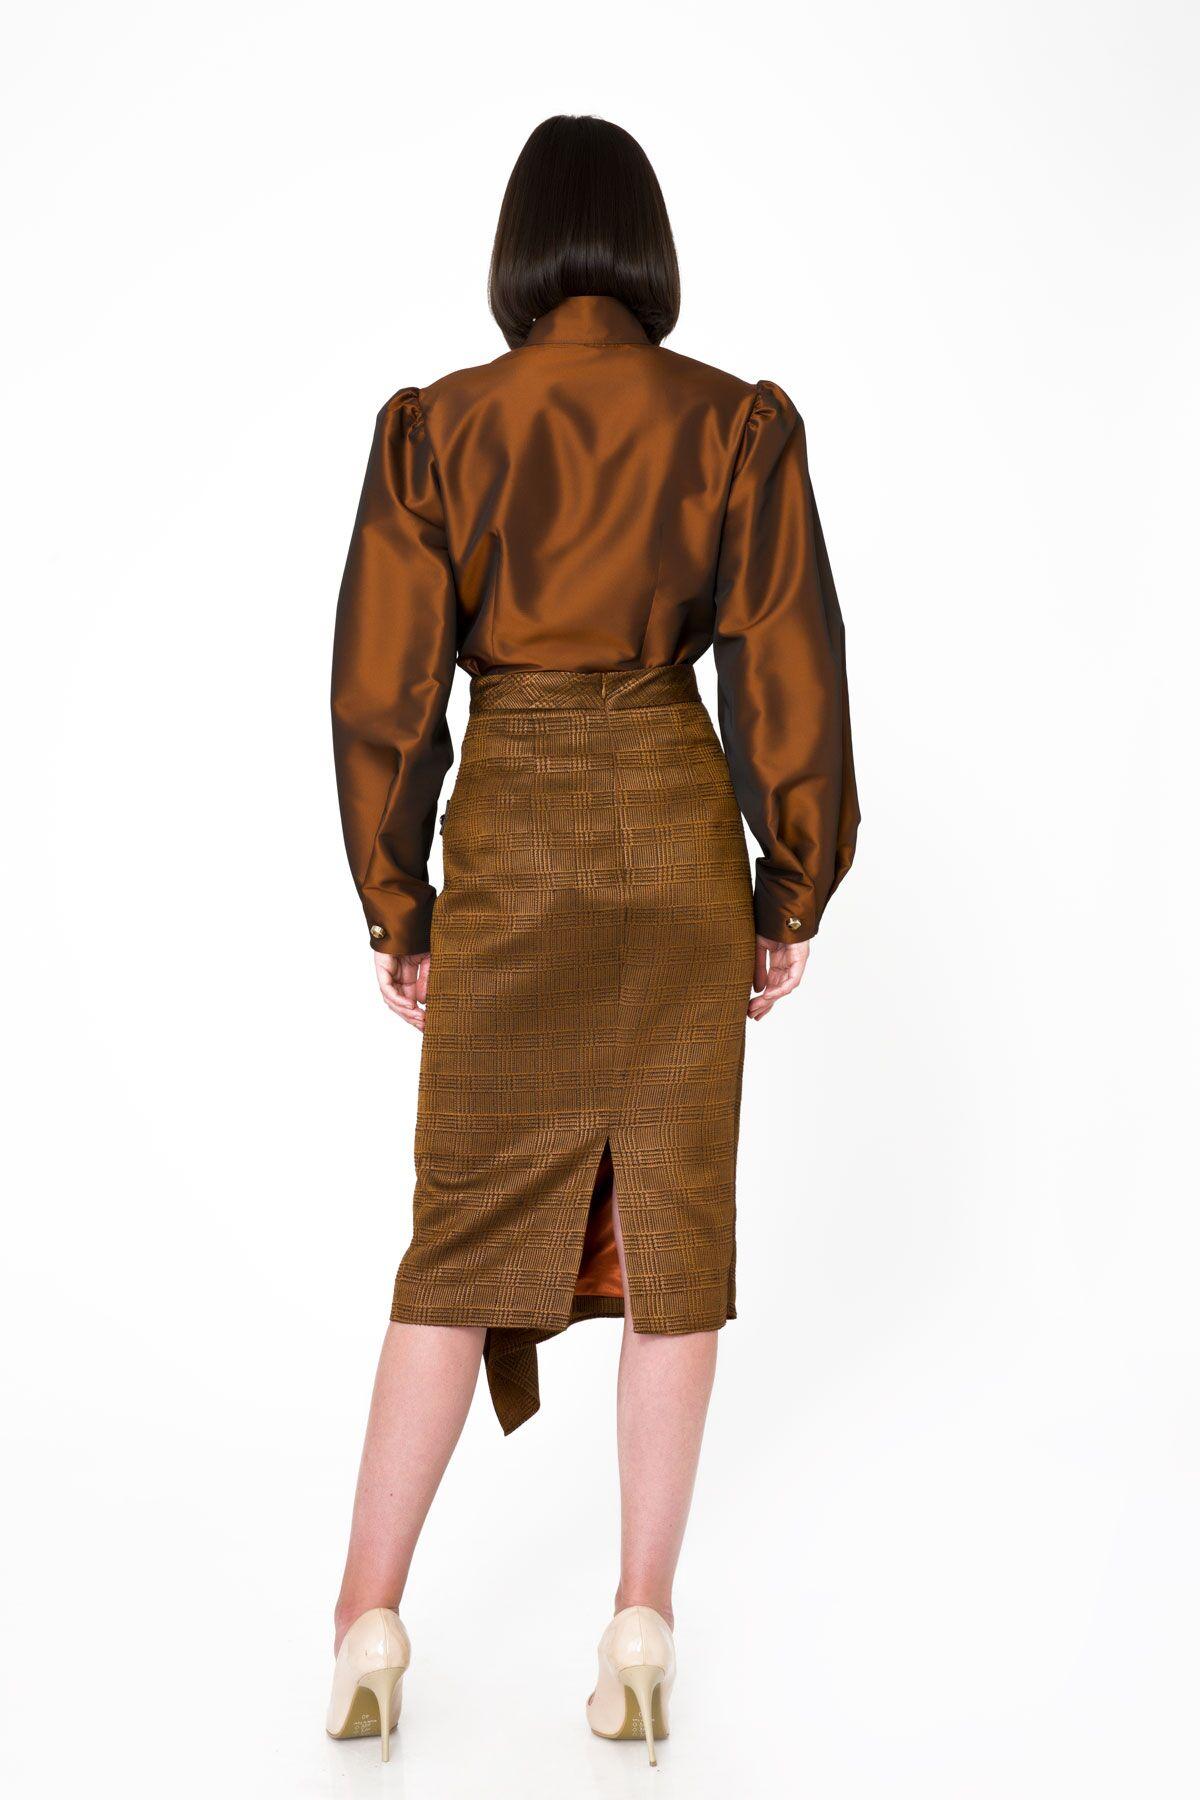 Asymmetric Cut Shiny Pencil Skirt With Buckle Detail